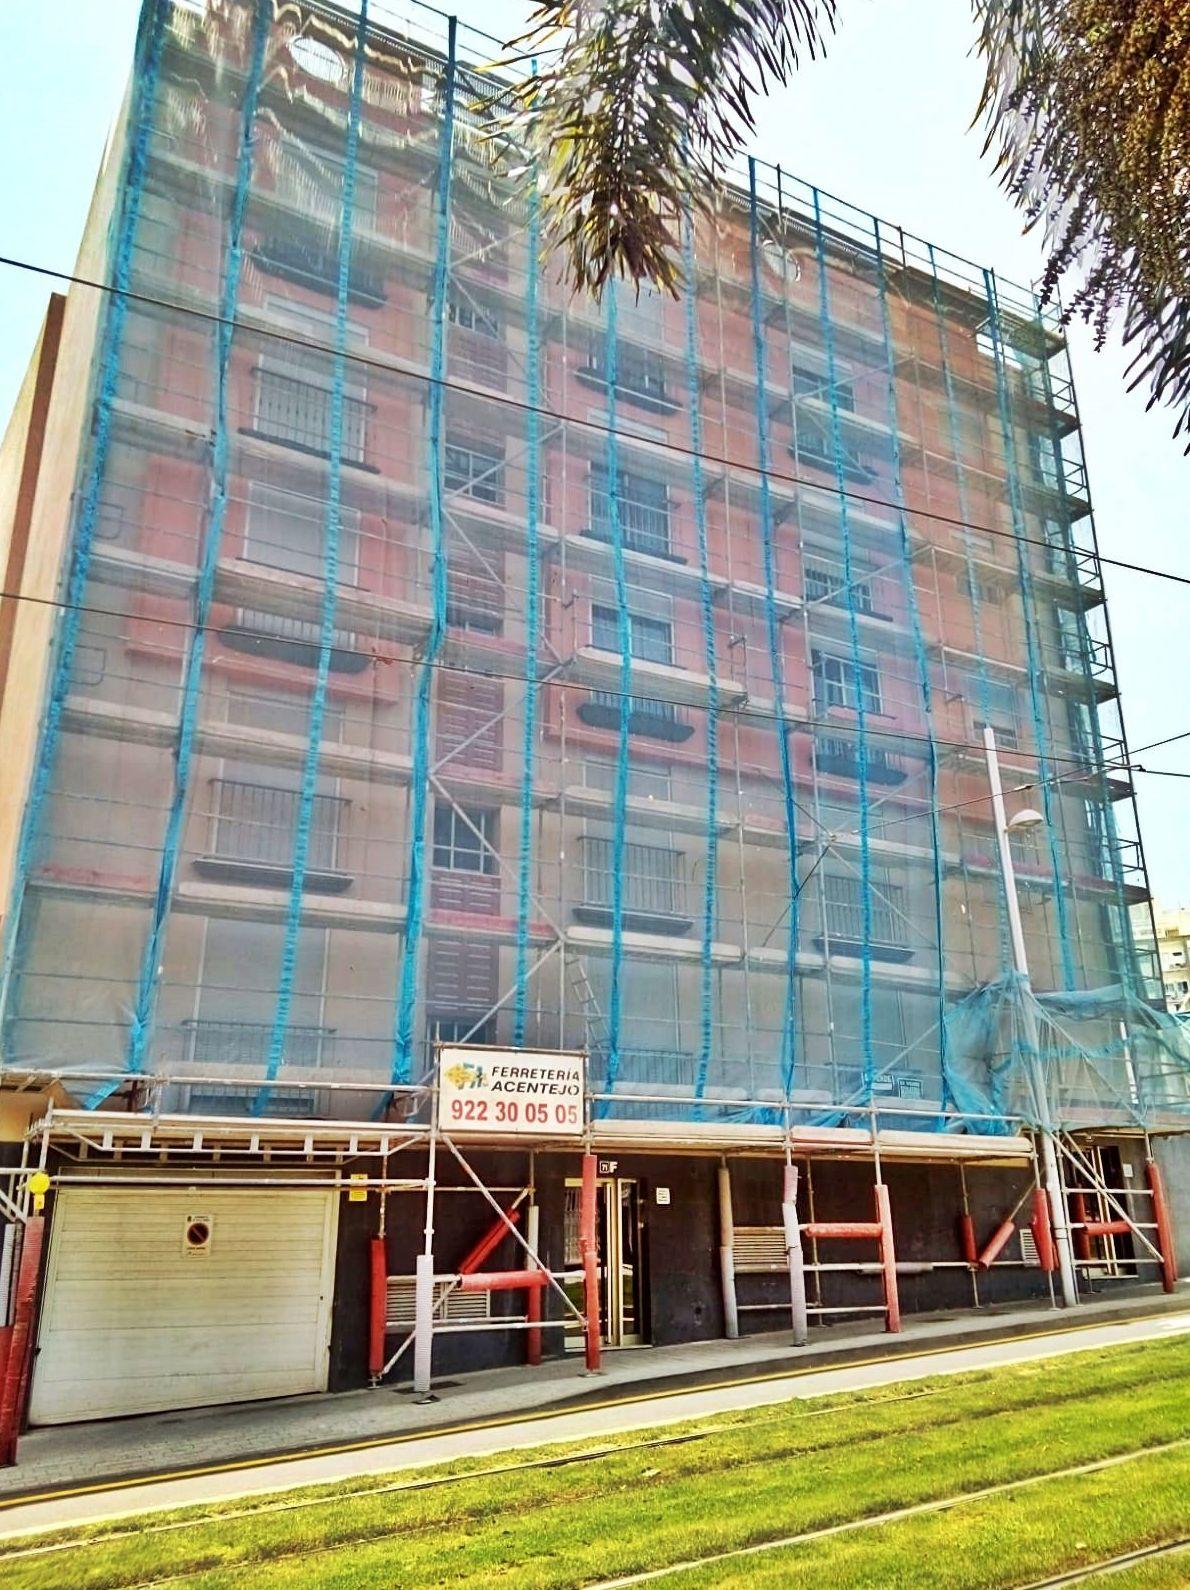 Rehabilitación de cornisas en edificio con andamio de fachada. Santa Cruz de Tenerife.